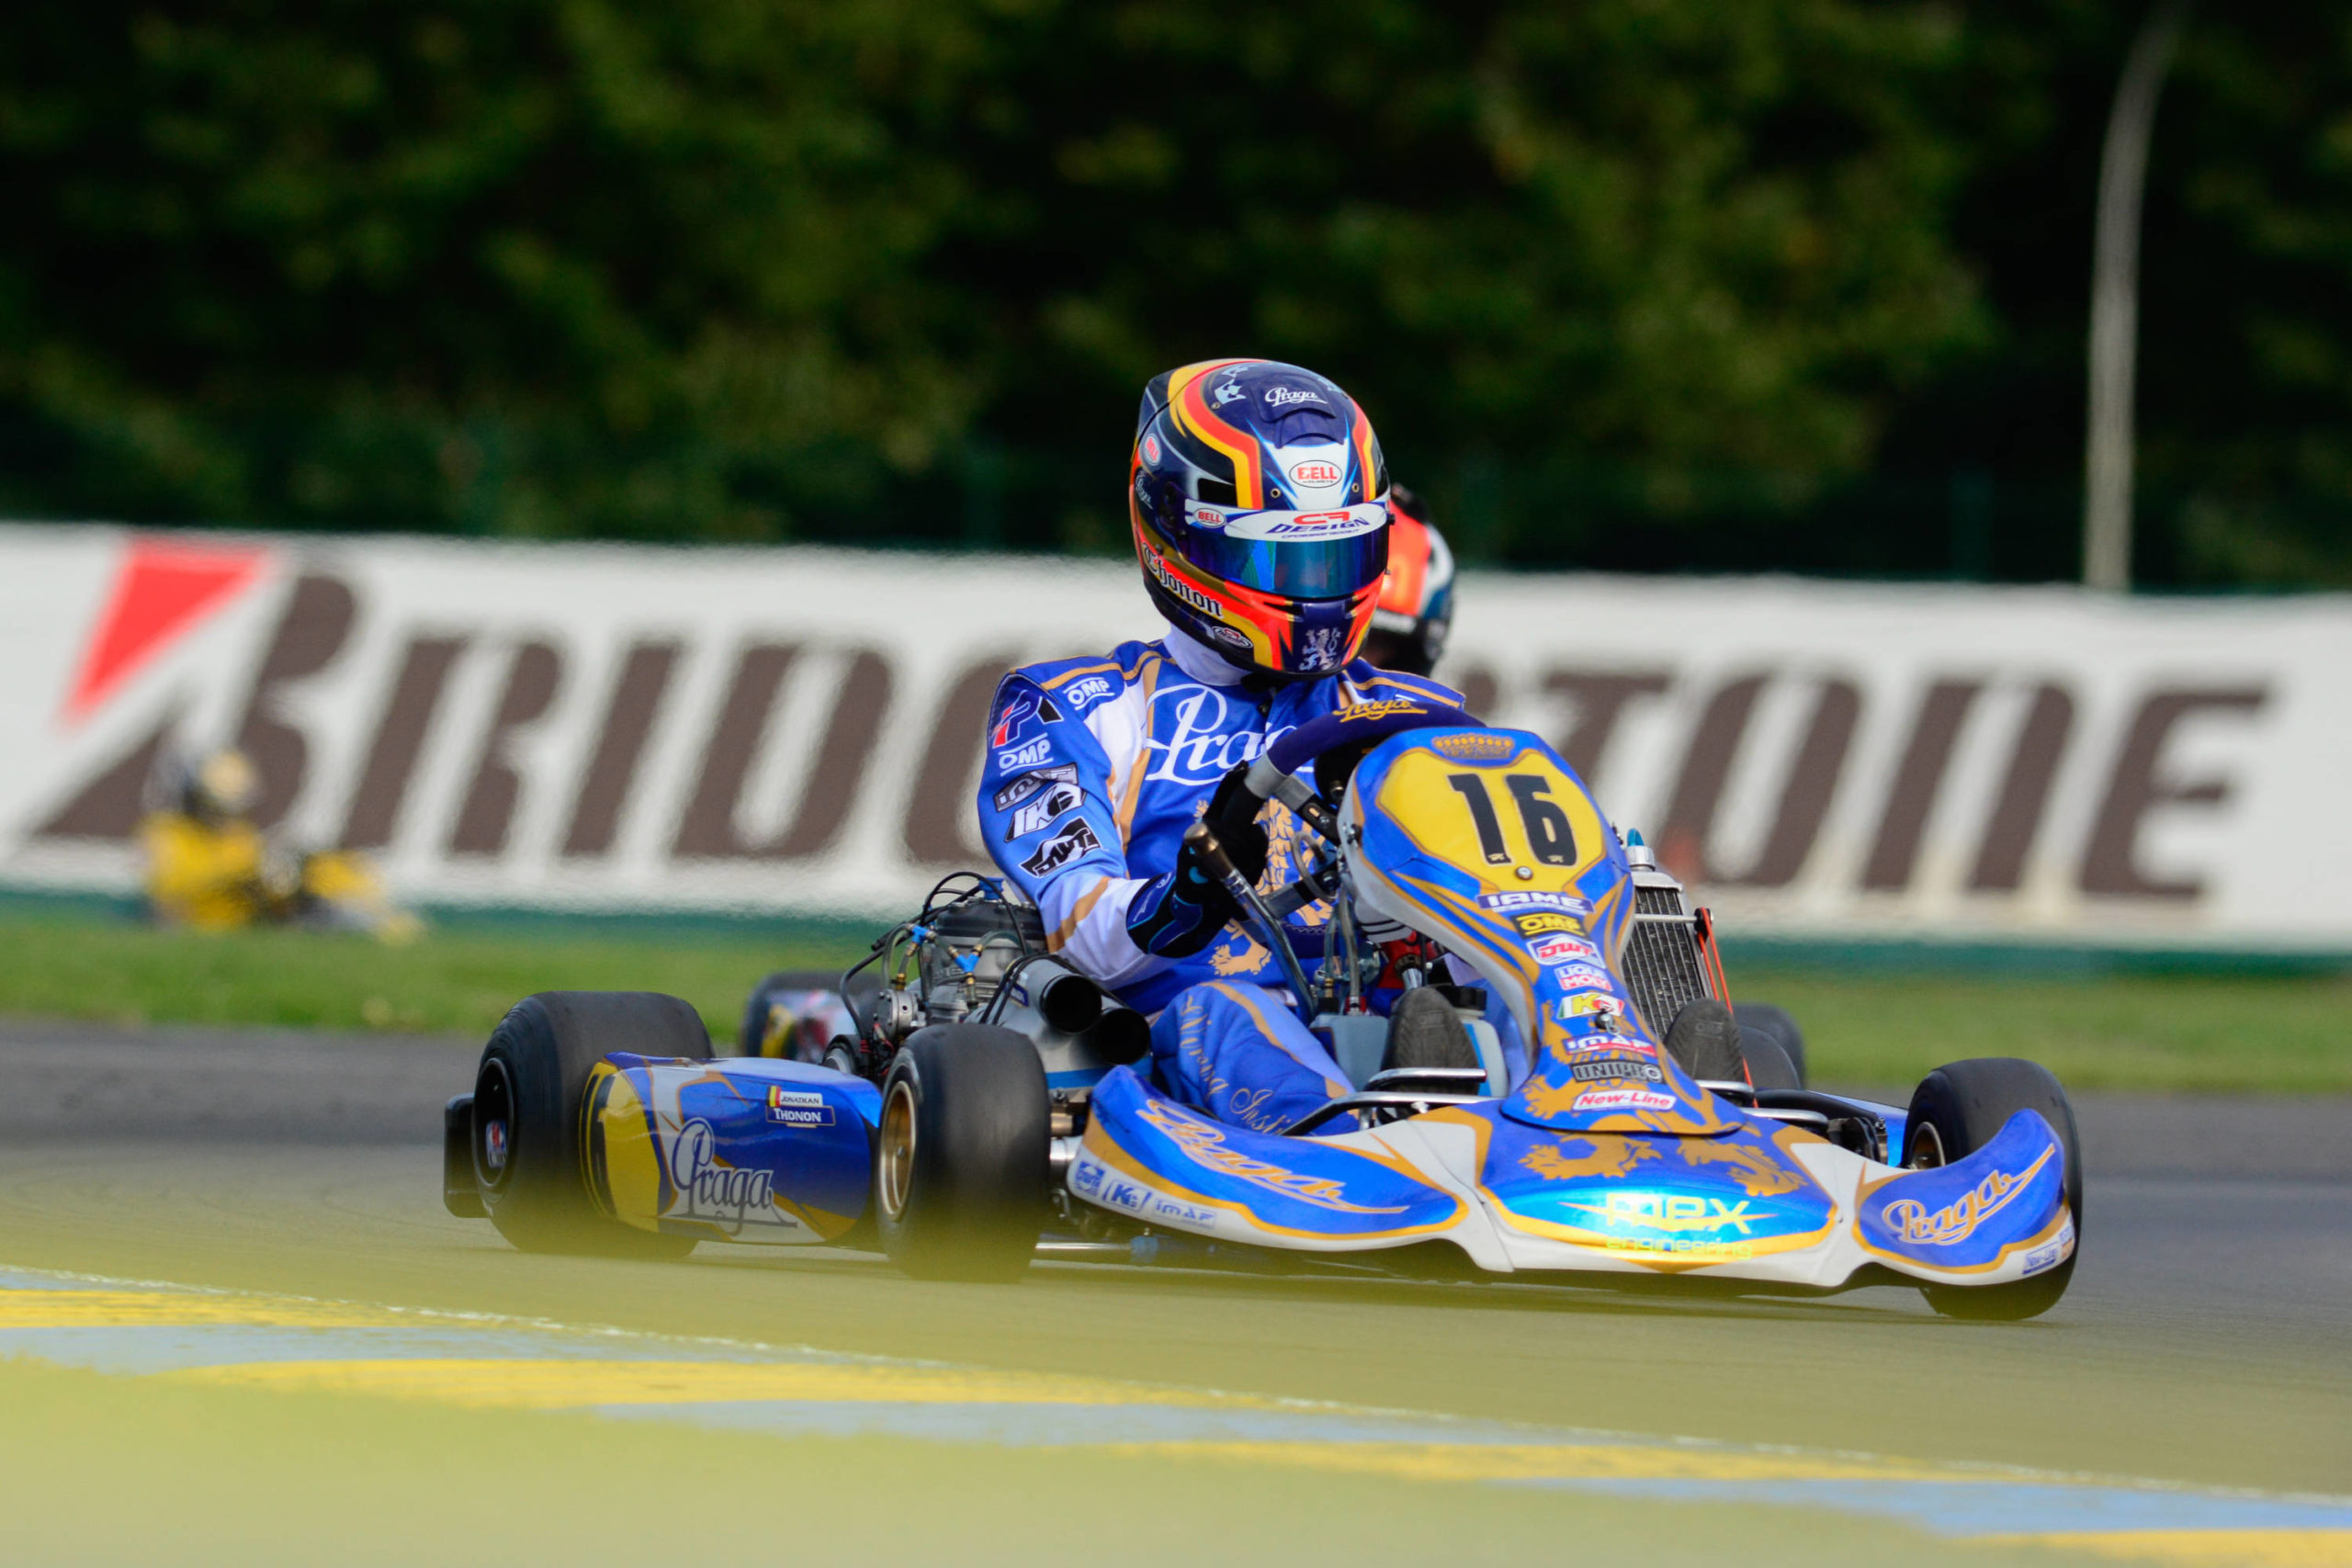 PRAGA Kart Racing after the World Championship